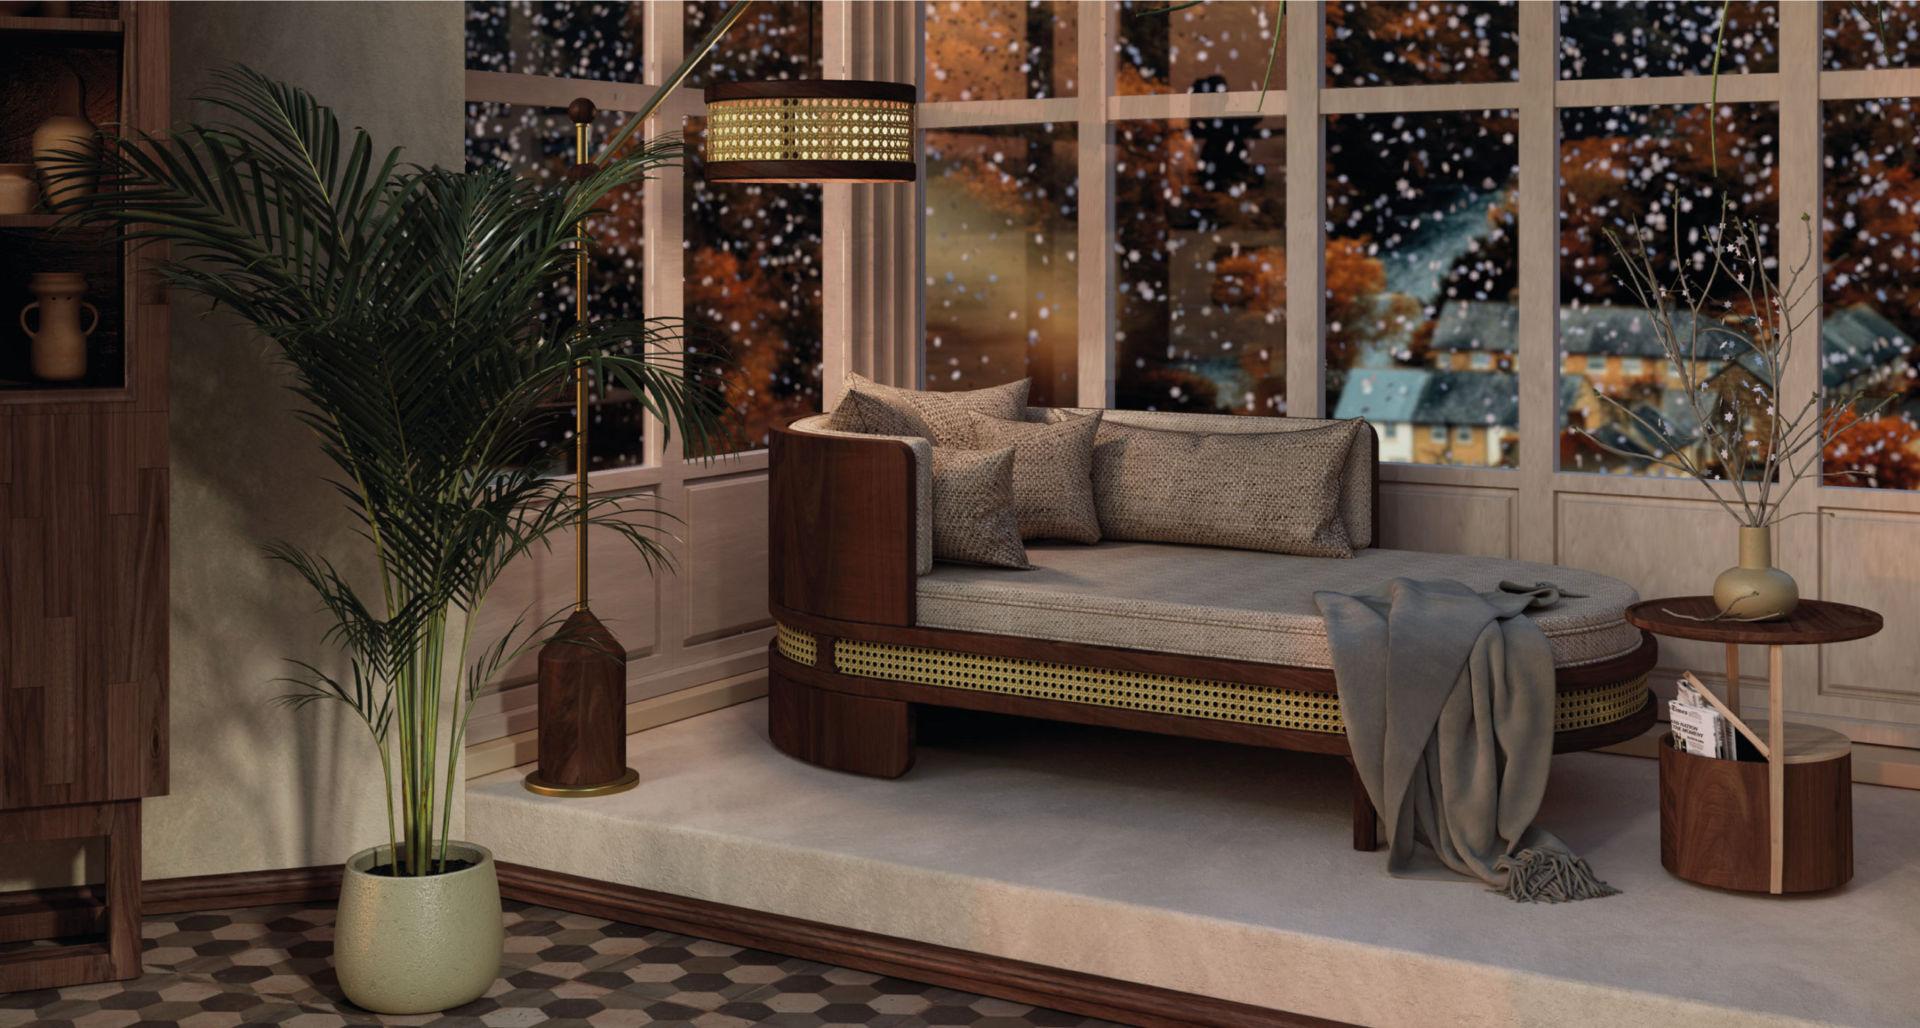 Winter Garden with Hamilton Floor Lamp, Brooks Chaise Longue and Burton side table